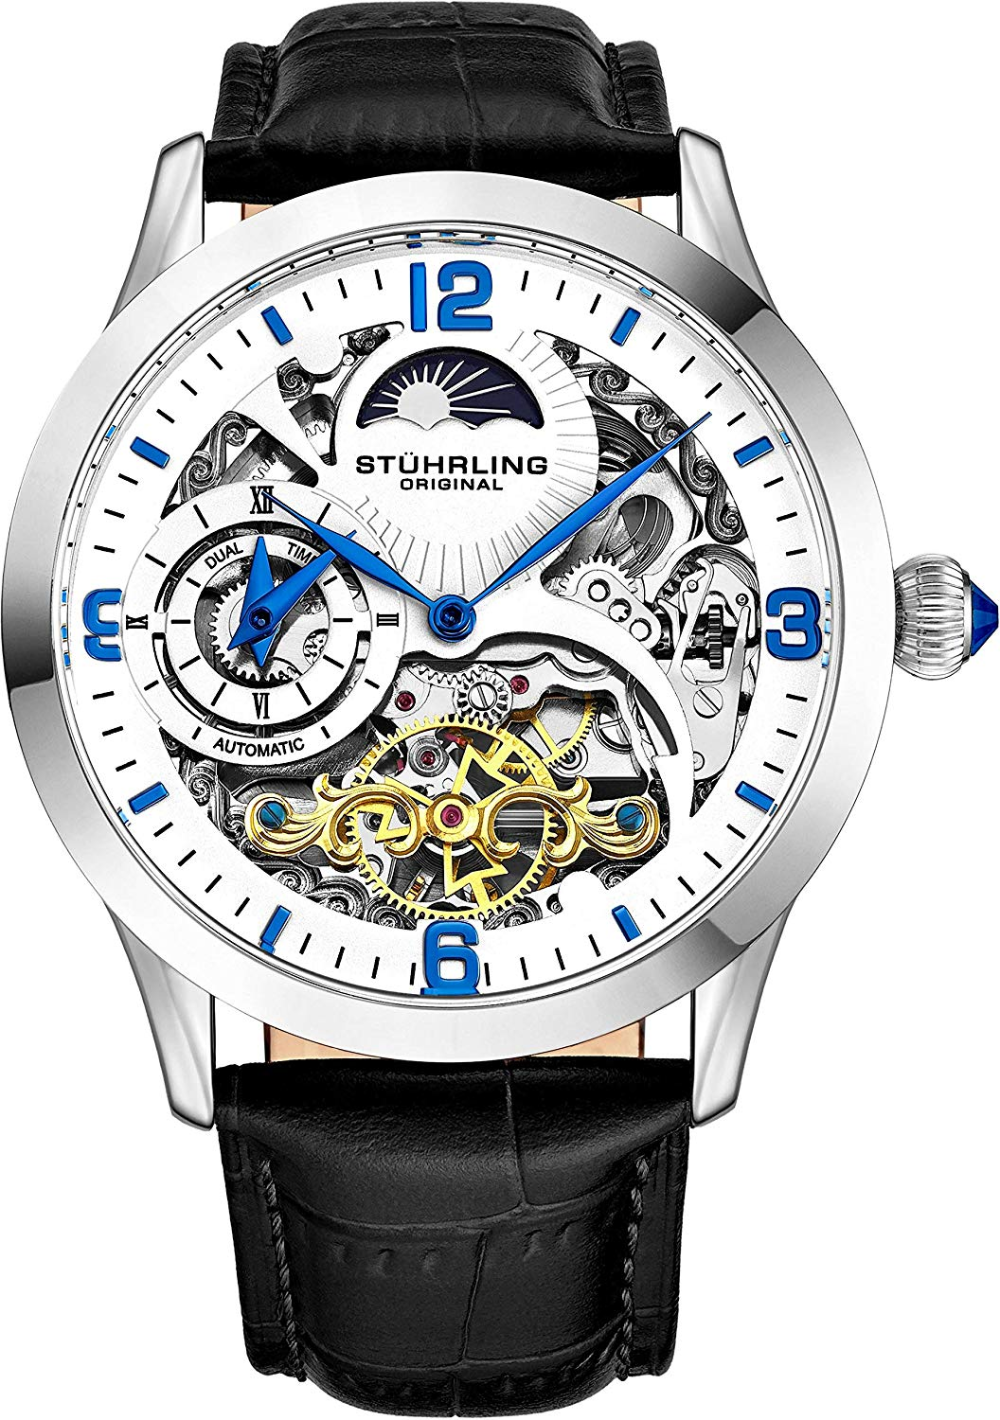 Stührling Original Automatic Watch for Men